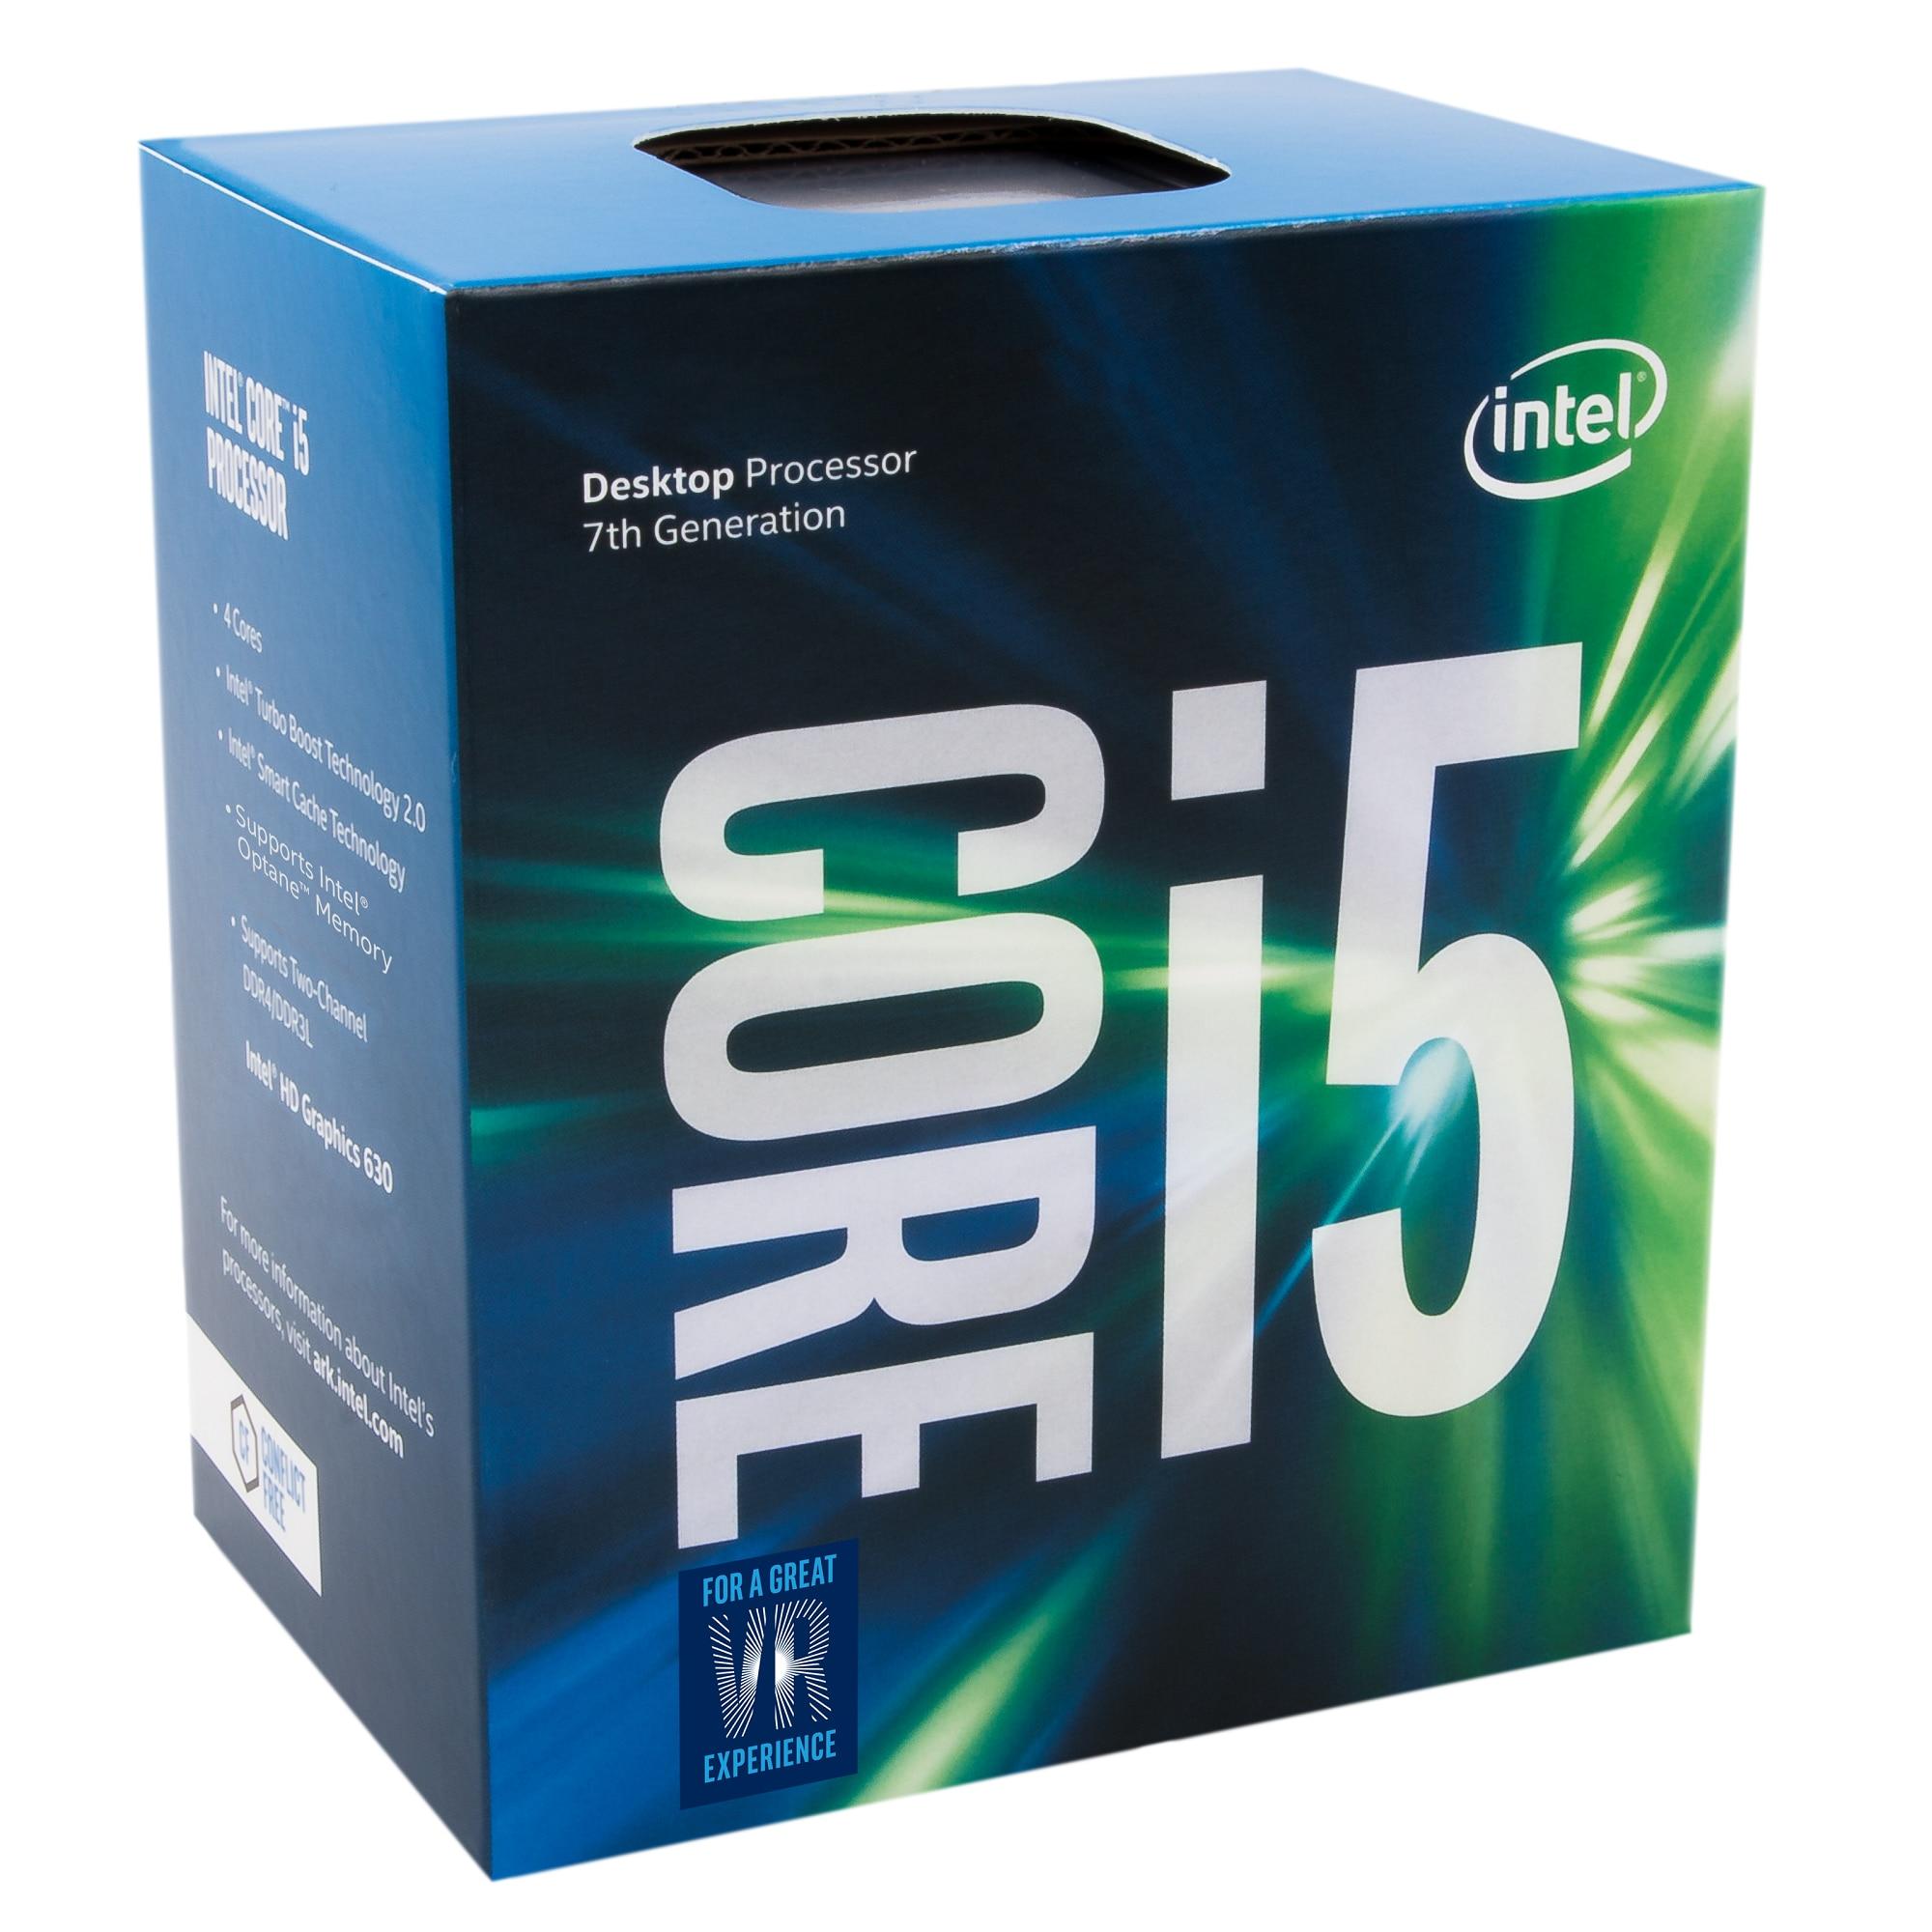 Fotografie Procesor Intel Core™ i5-7400, 3.00Ghz, Kaby Lake, 6MB, Socket 1151, BOX